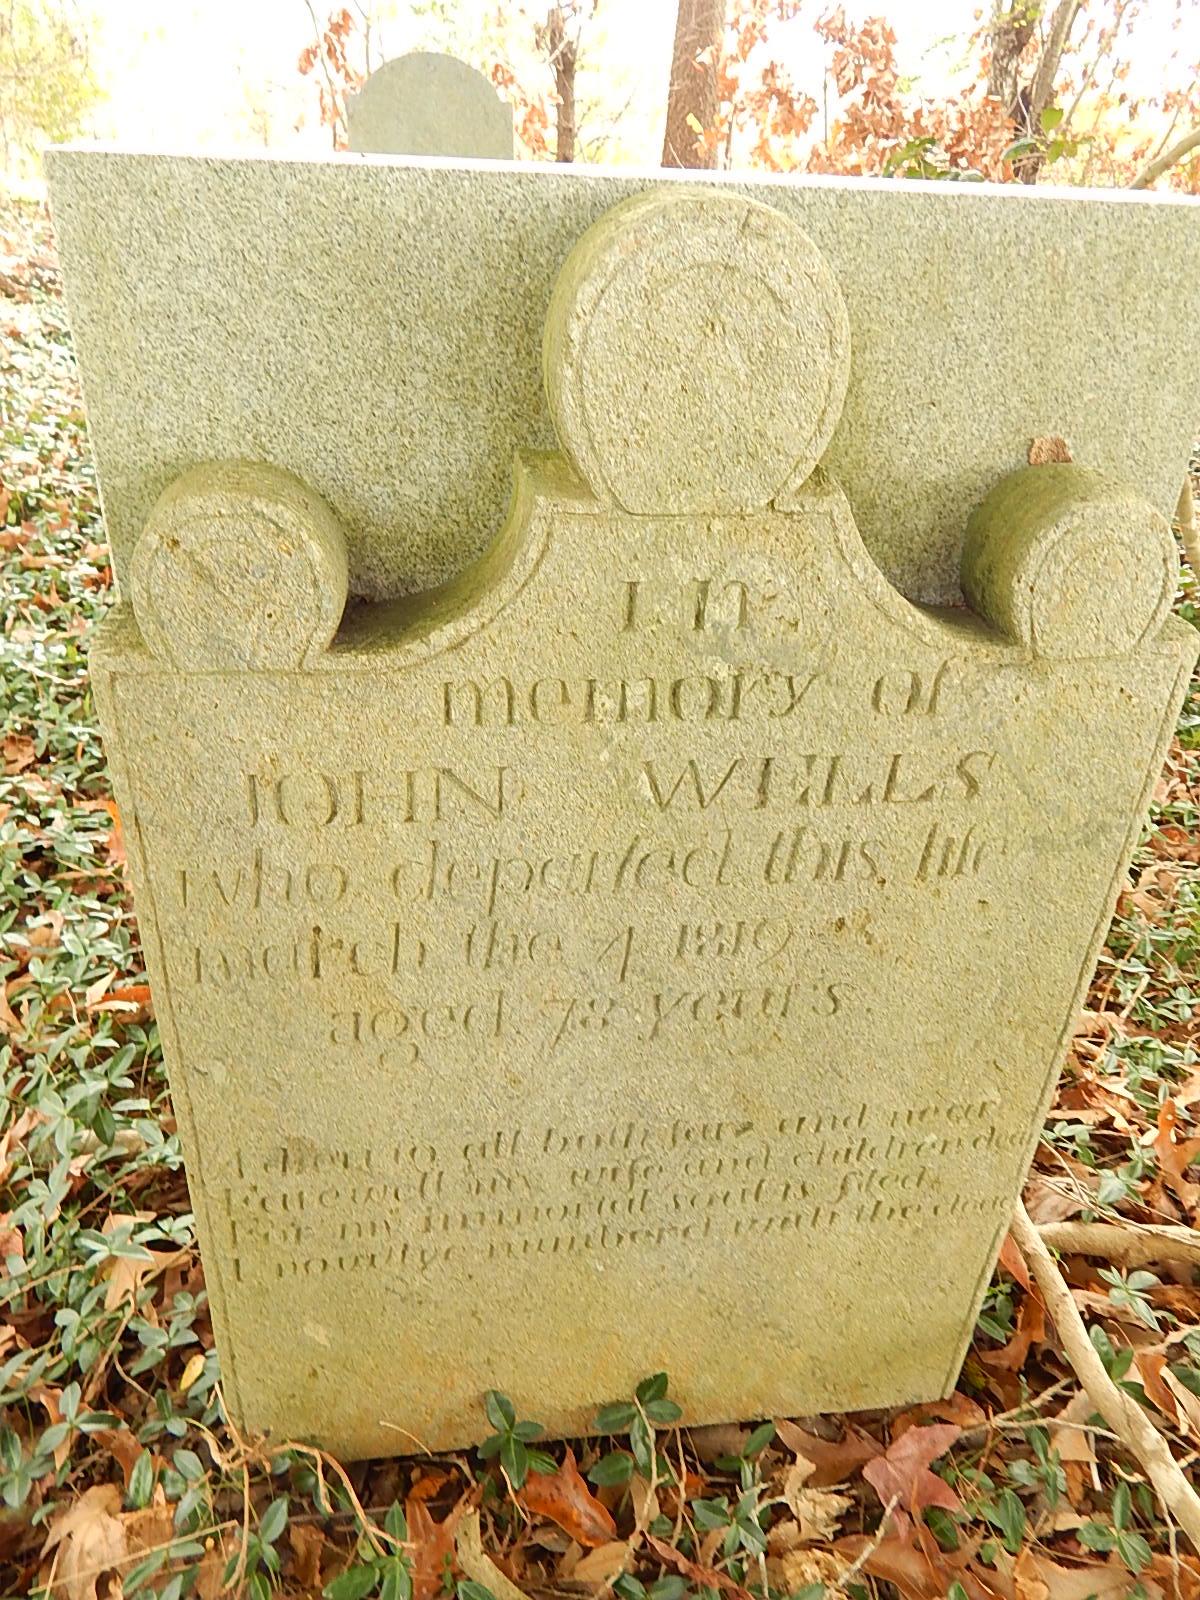 John Wells